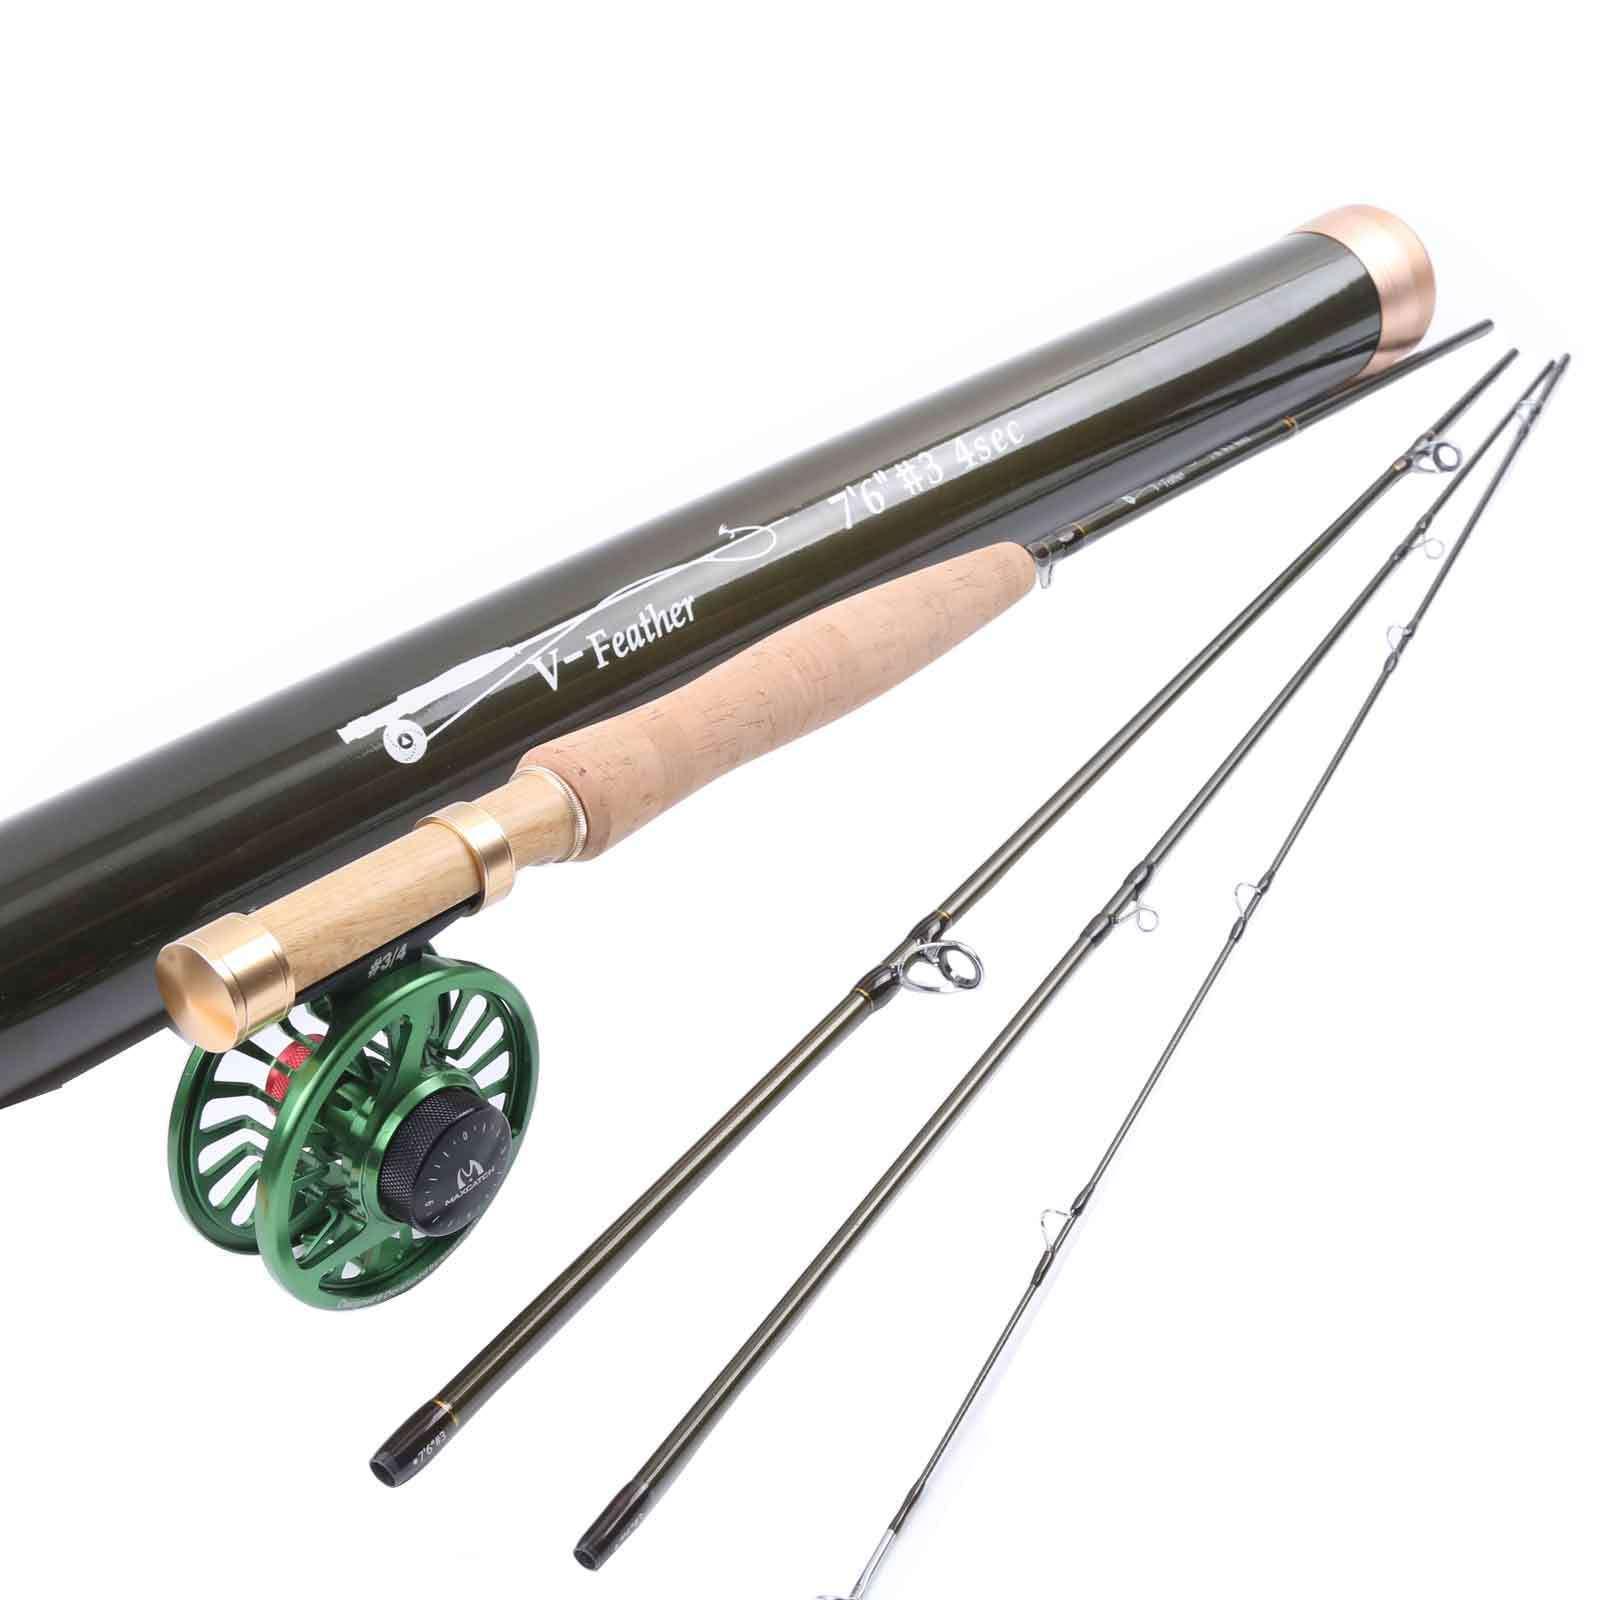 Maxcatch 3wt 7' 6 4sezione Fly Rod Media VELOCE VOLO Pesca rod&fly REEL